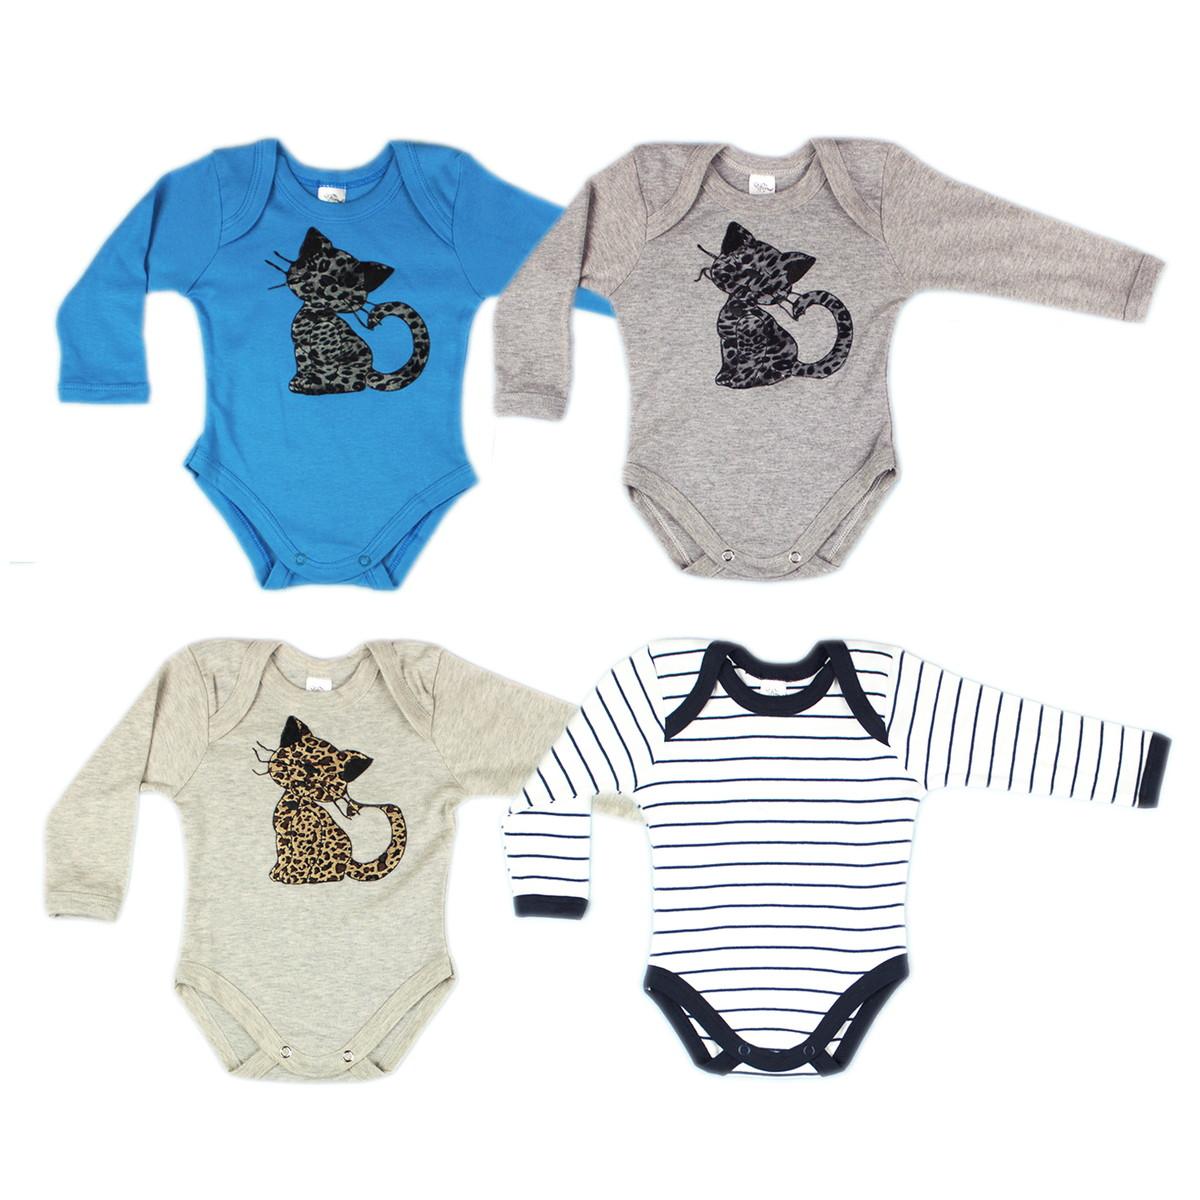 Kit Bebê Body Infantil Menino (4 Peças P) no Elo7  0aa0a24a21d